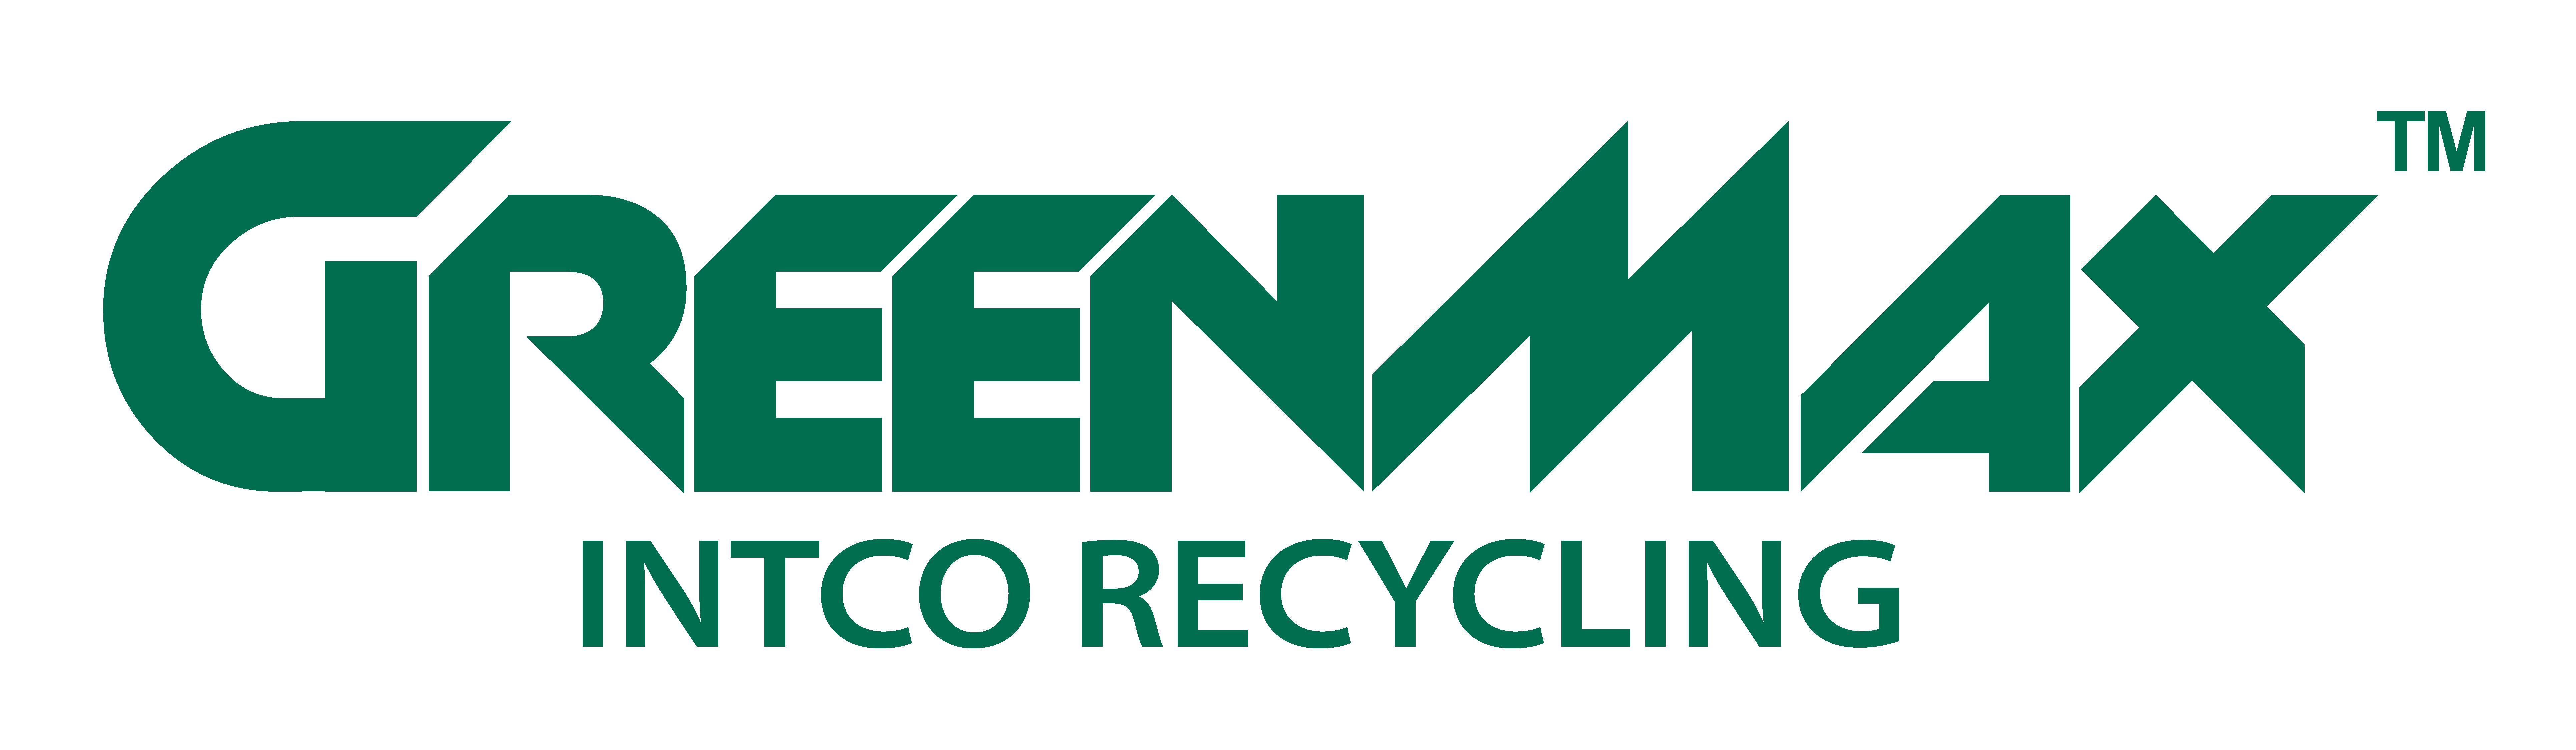 foam recycling machine